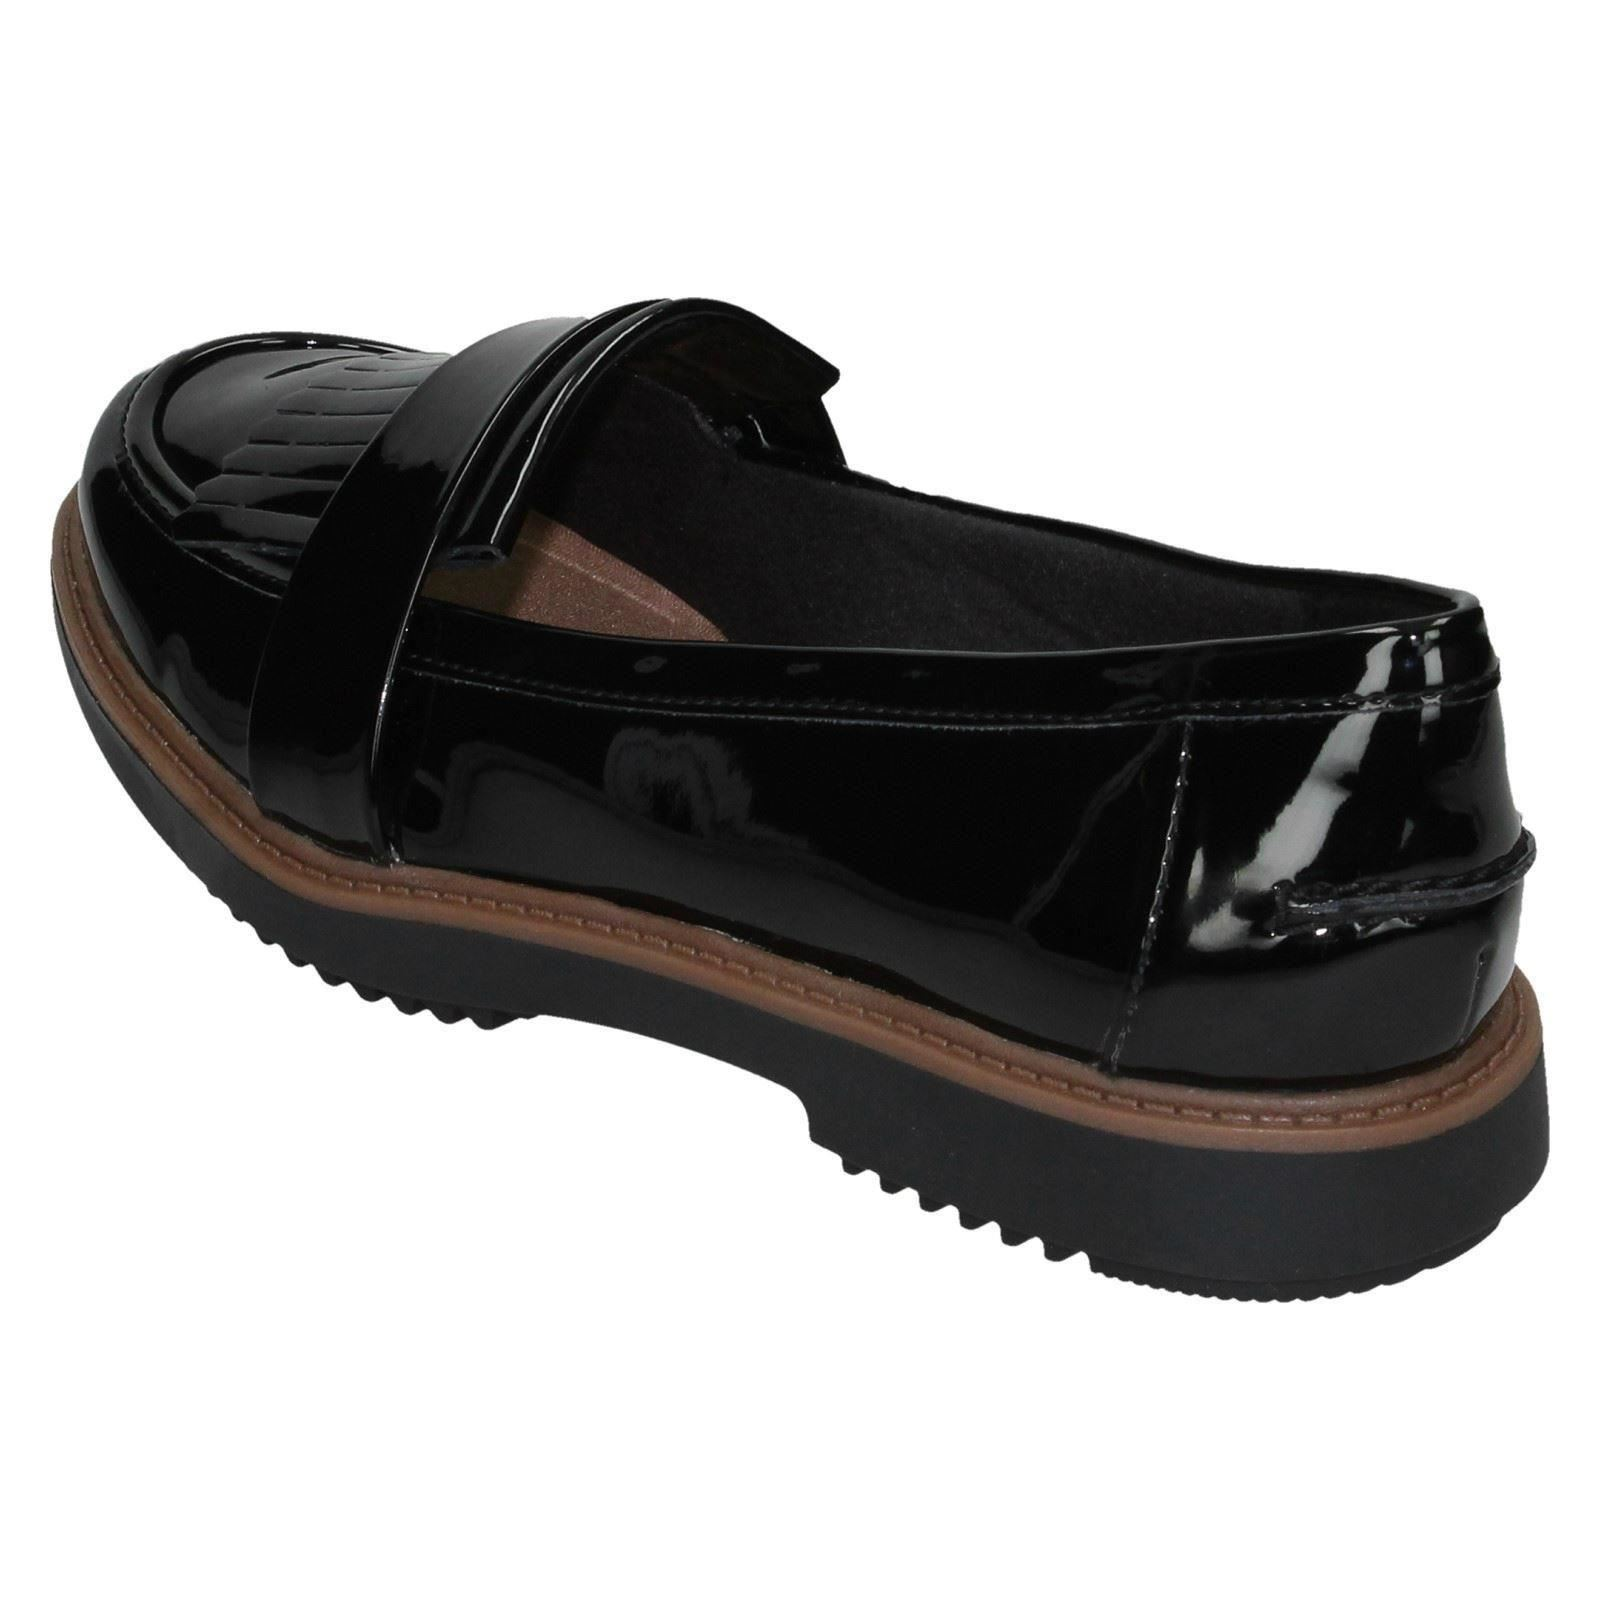 Ladies Clarks Slip On Formal Shoes *Raisie Theresa*